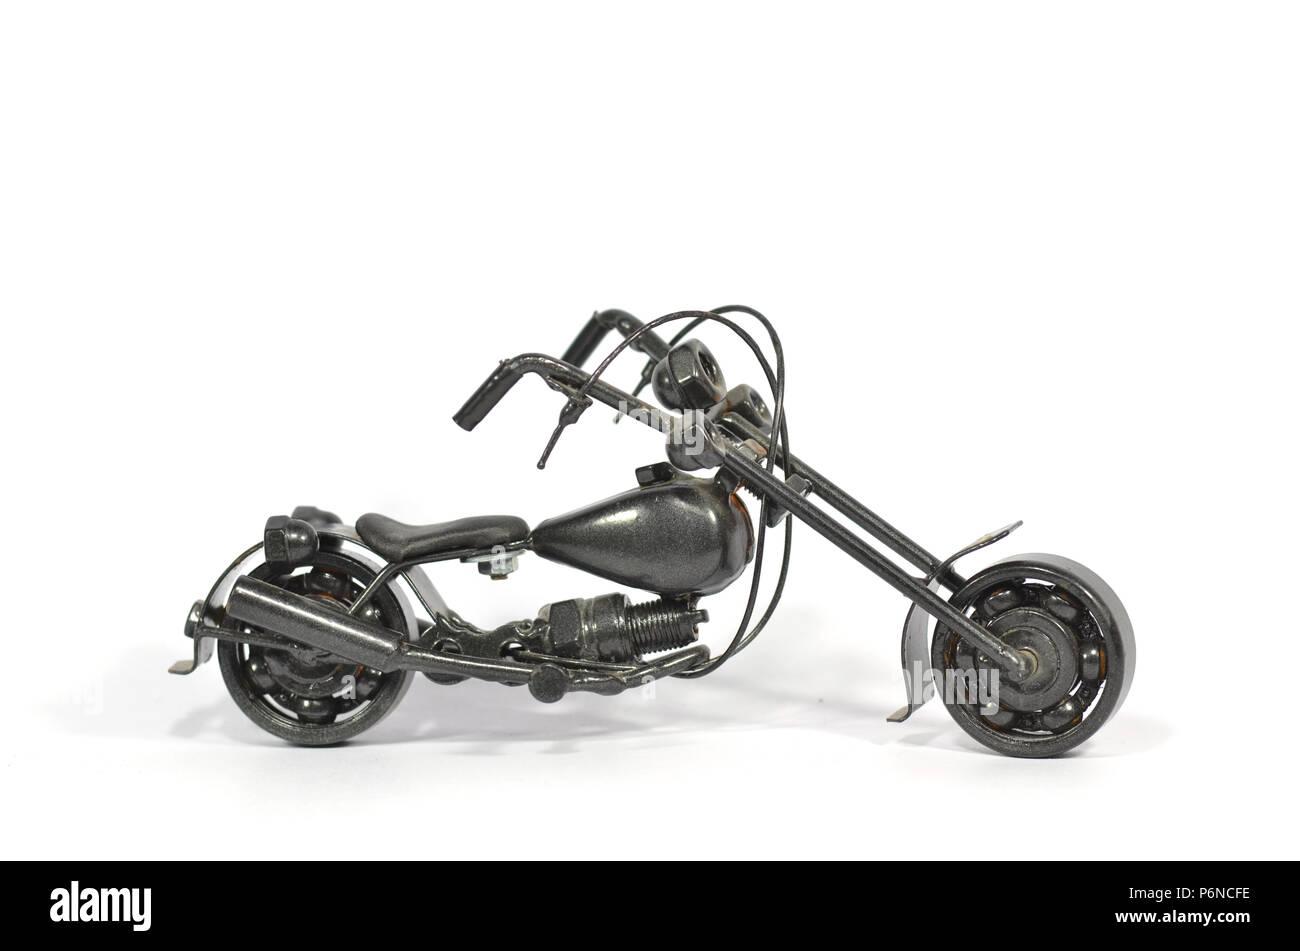 chopper motorcycle , isolated on white. - Stock Image